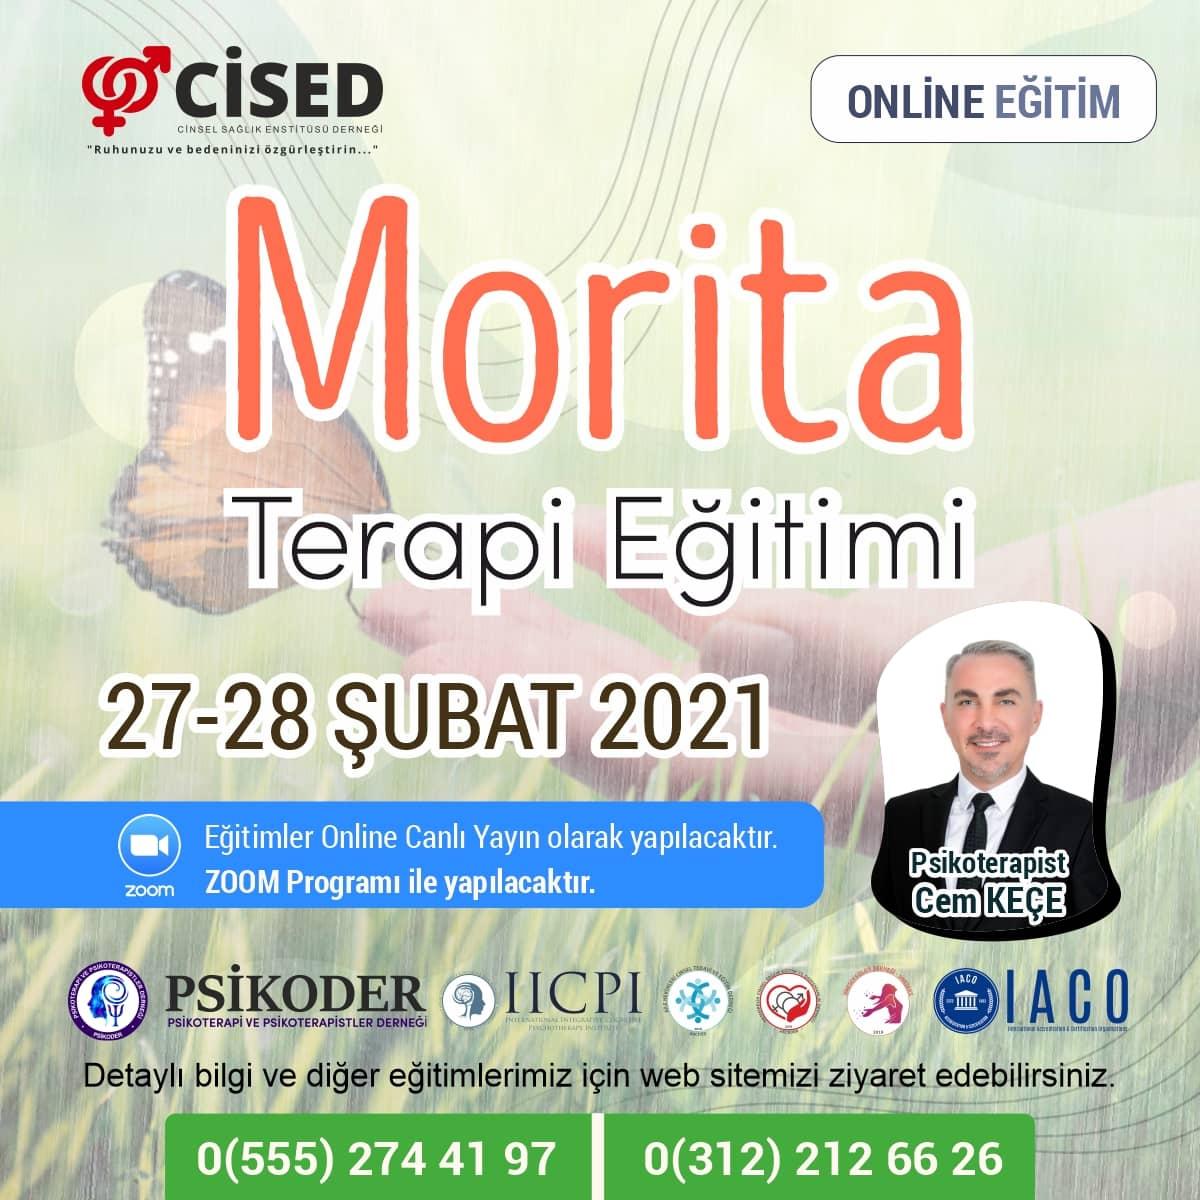 Morita Terapi Eğitimi